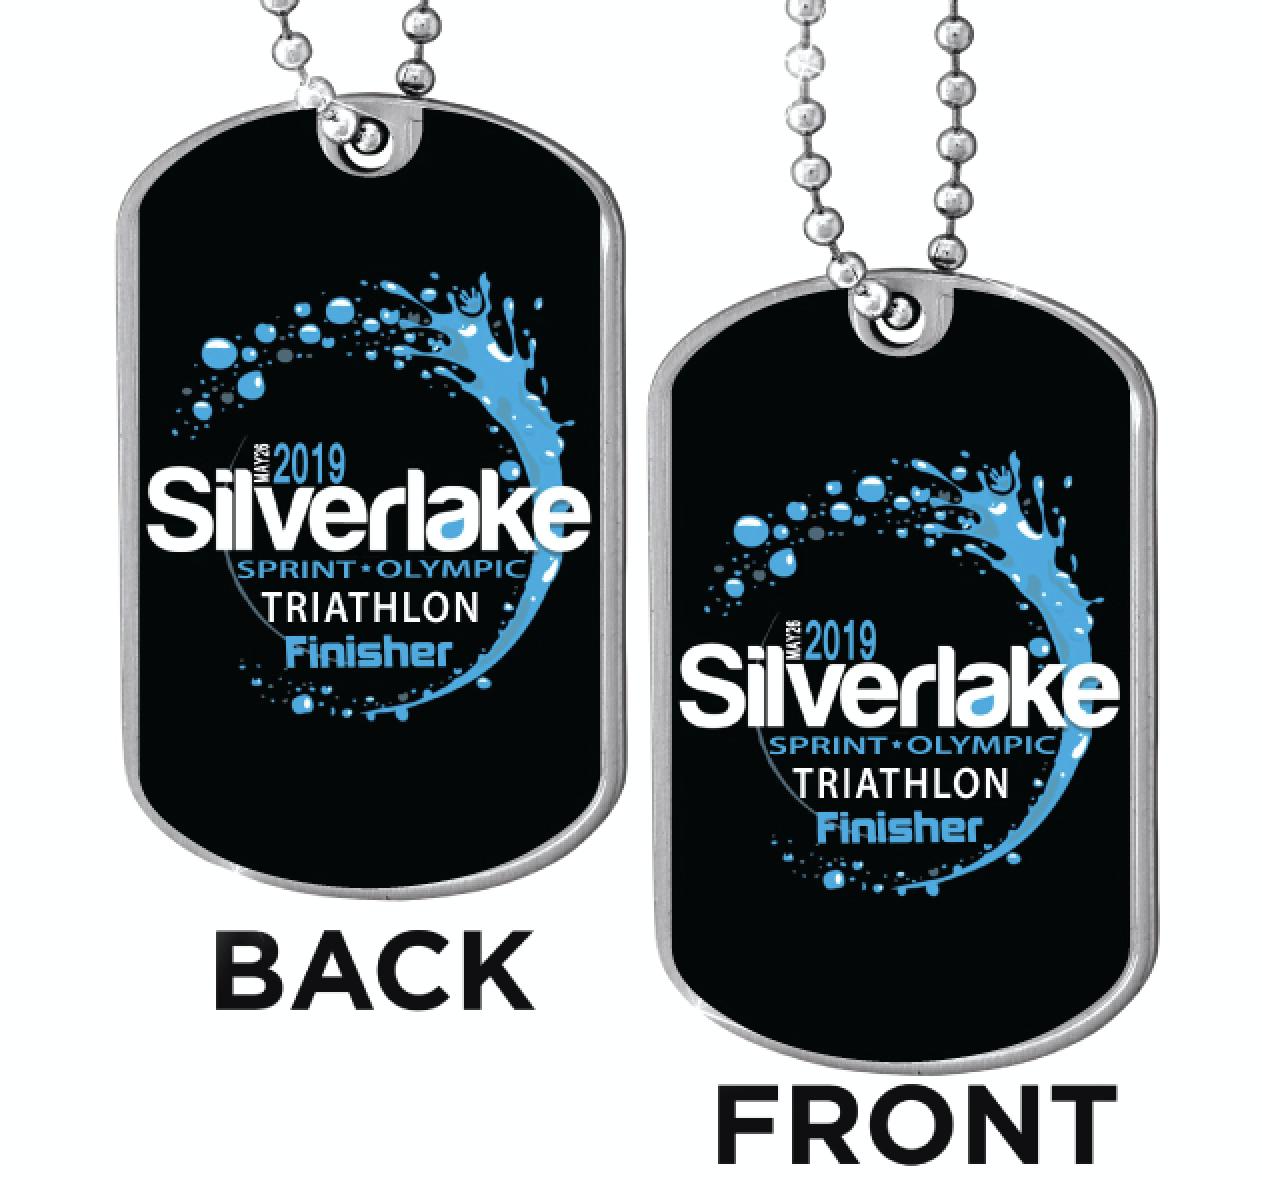 Pearland's Premier Triathlon | Silverlake Triathlon 2019